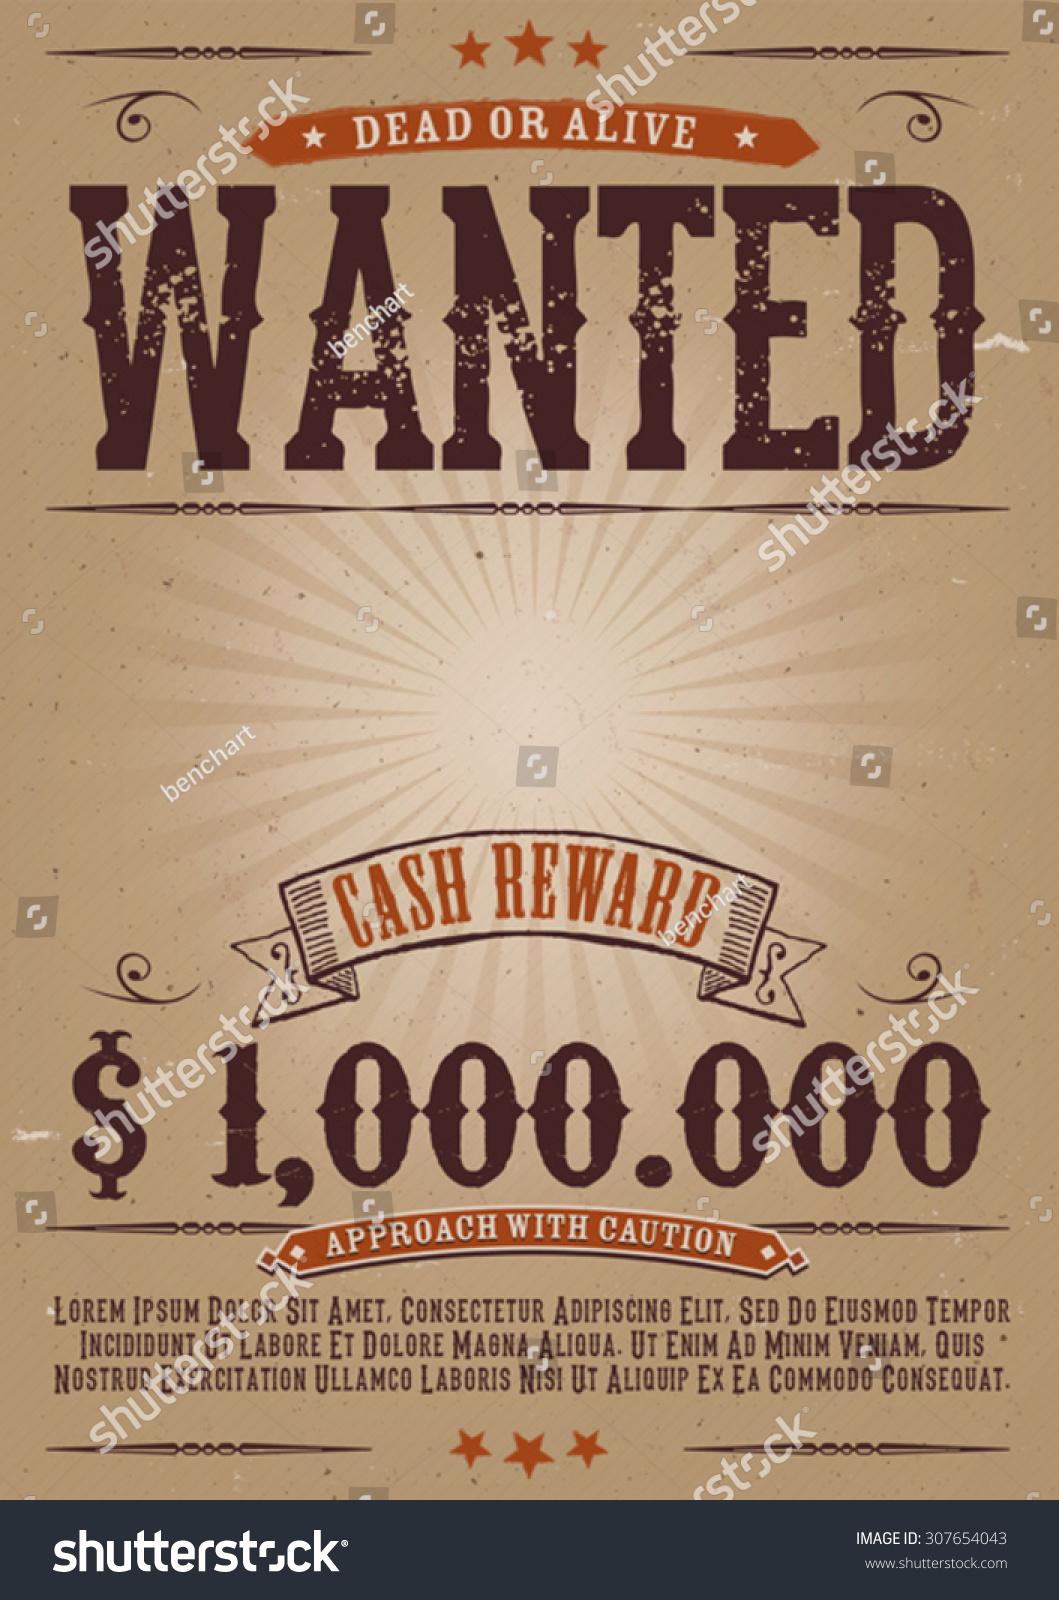 Wanted Vintage Western Poster illustration Vintage Old – Wanted Reward Poster Template